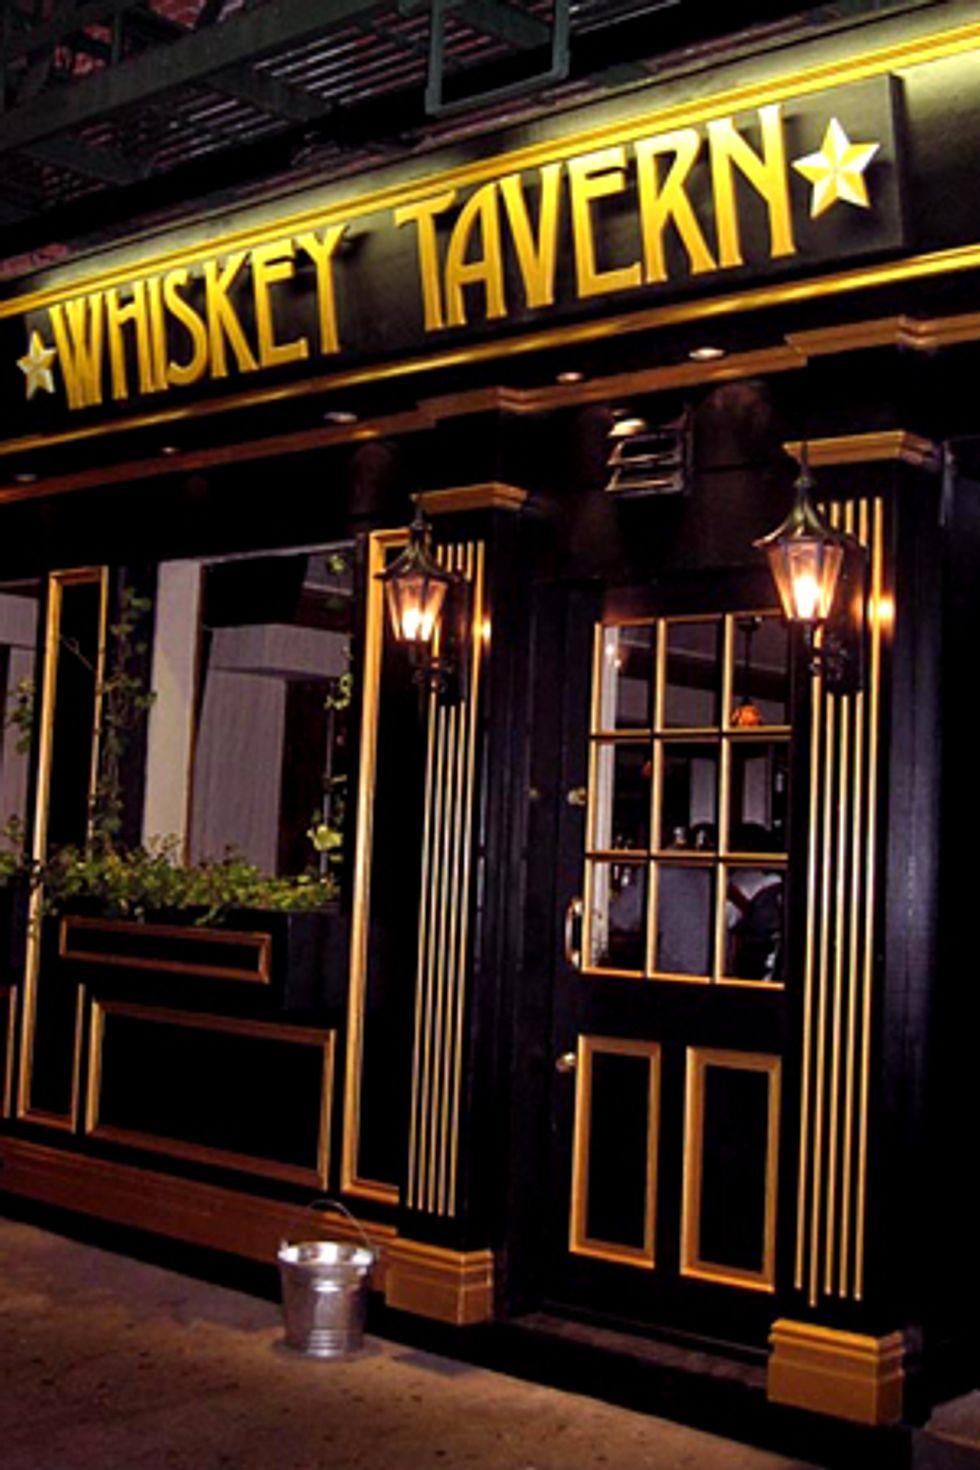 Bar of the Week:  Whiskey Tavern